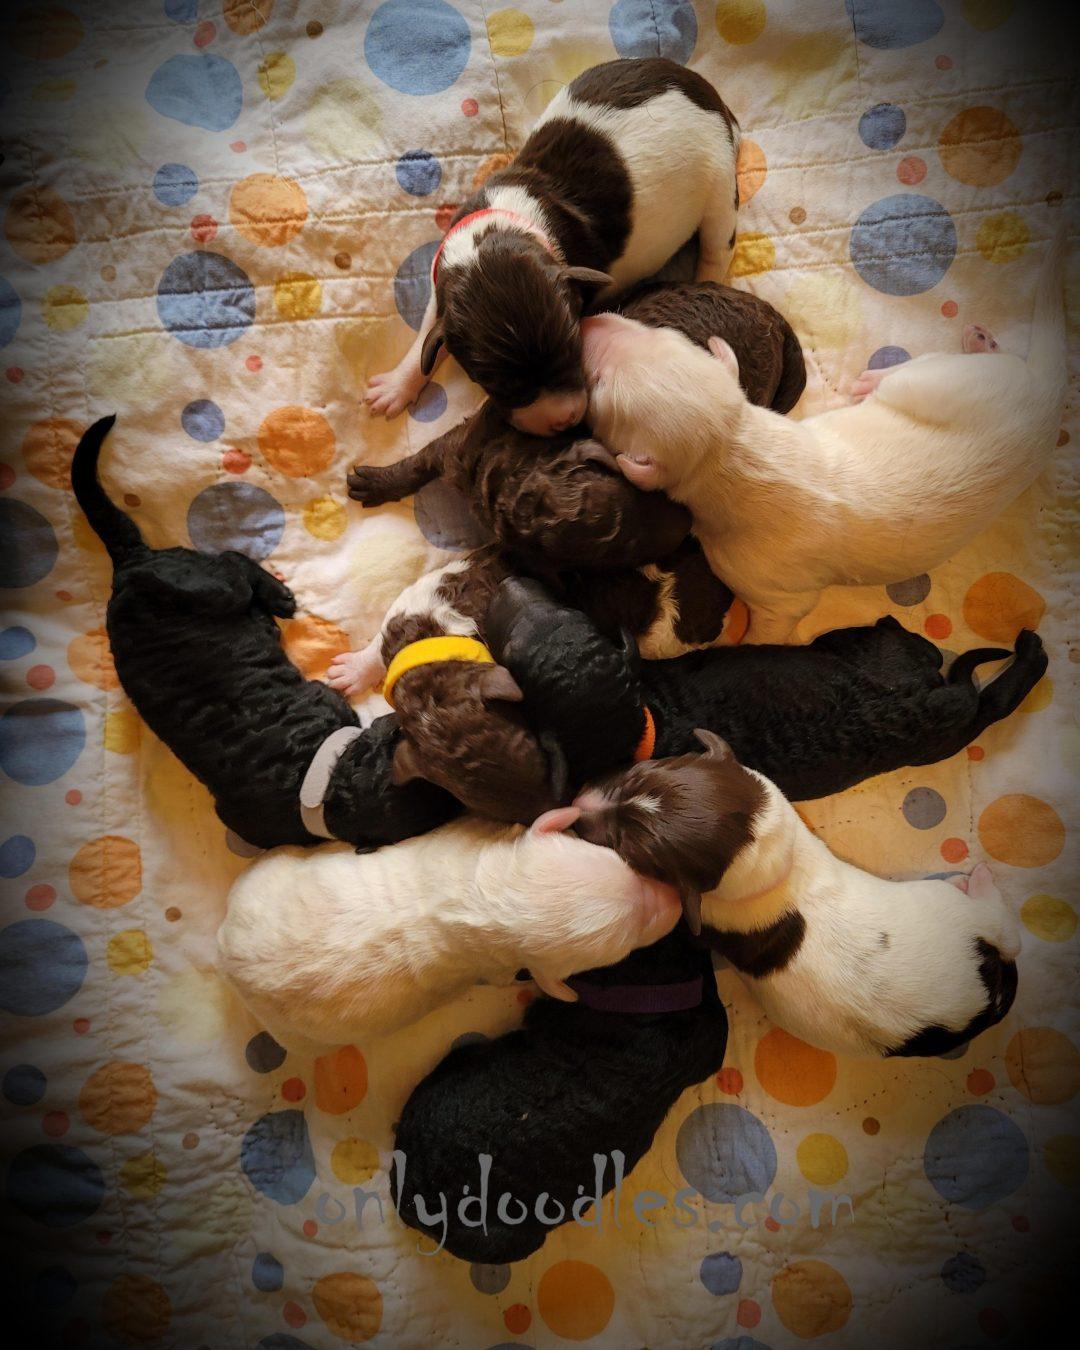 F1b Labradoodles puppies for sale in Alton, Missouri